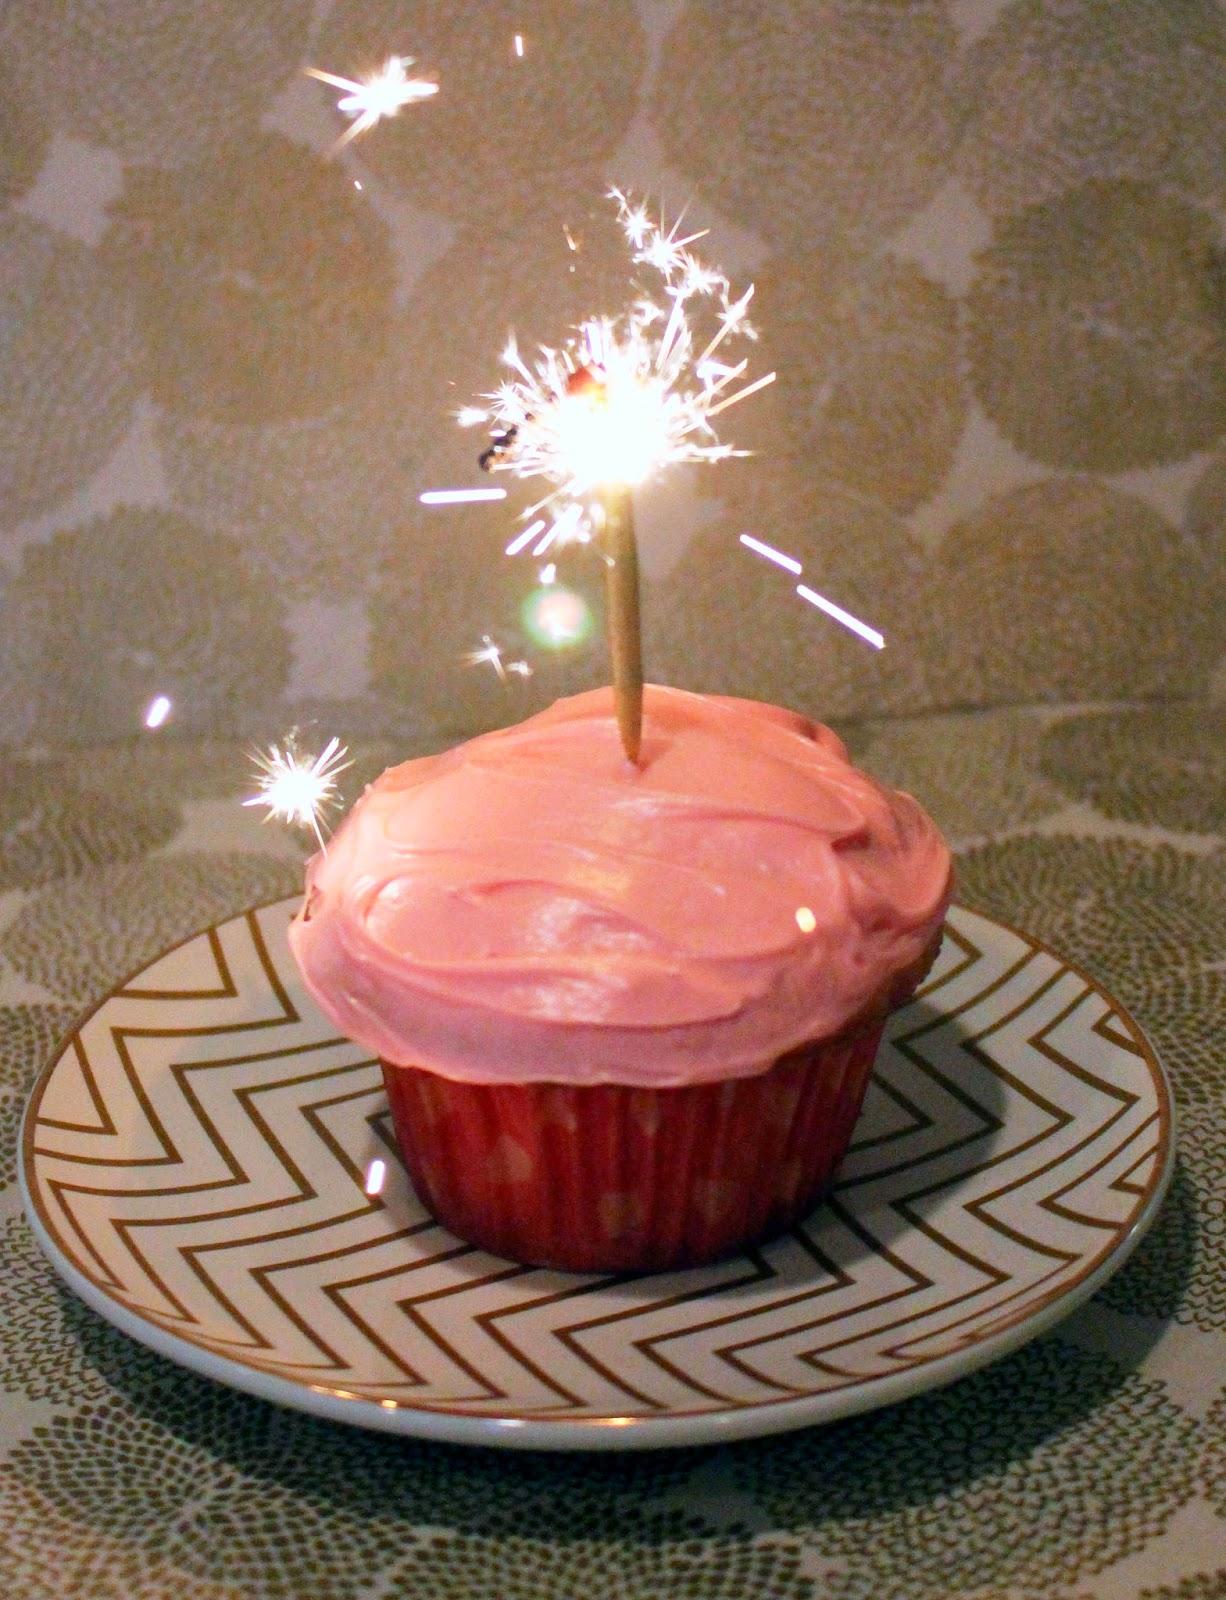 Happy Birthday, Whatever is Lovelier!